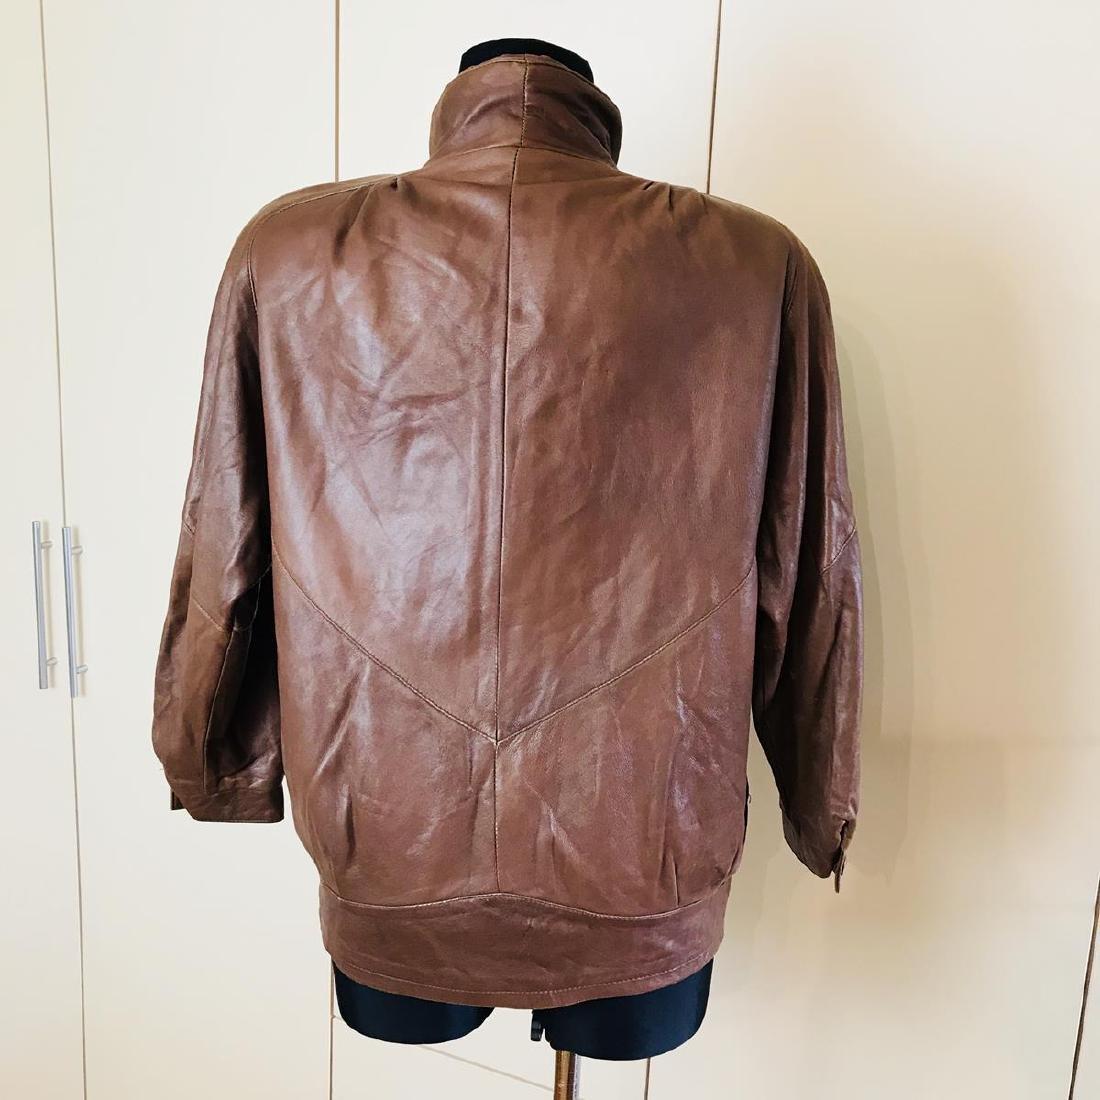 Vintage Women's Leather Jacket Coat - 5